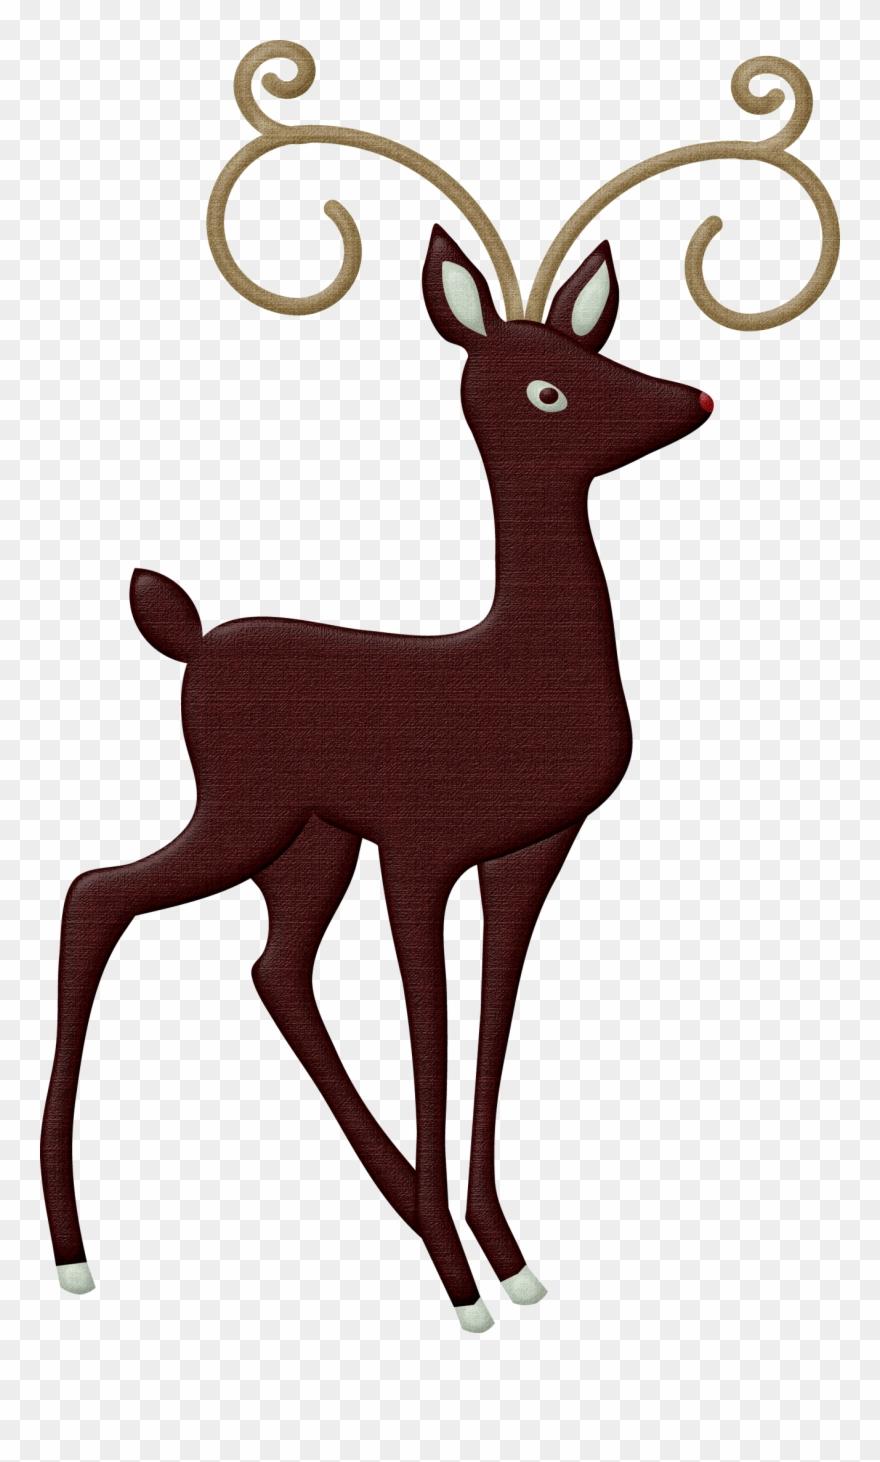 Christmas Reindeer Png.Christmas Reindeer Clip Art Animals Png Facing Right